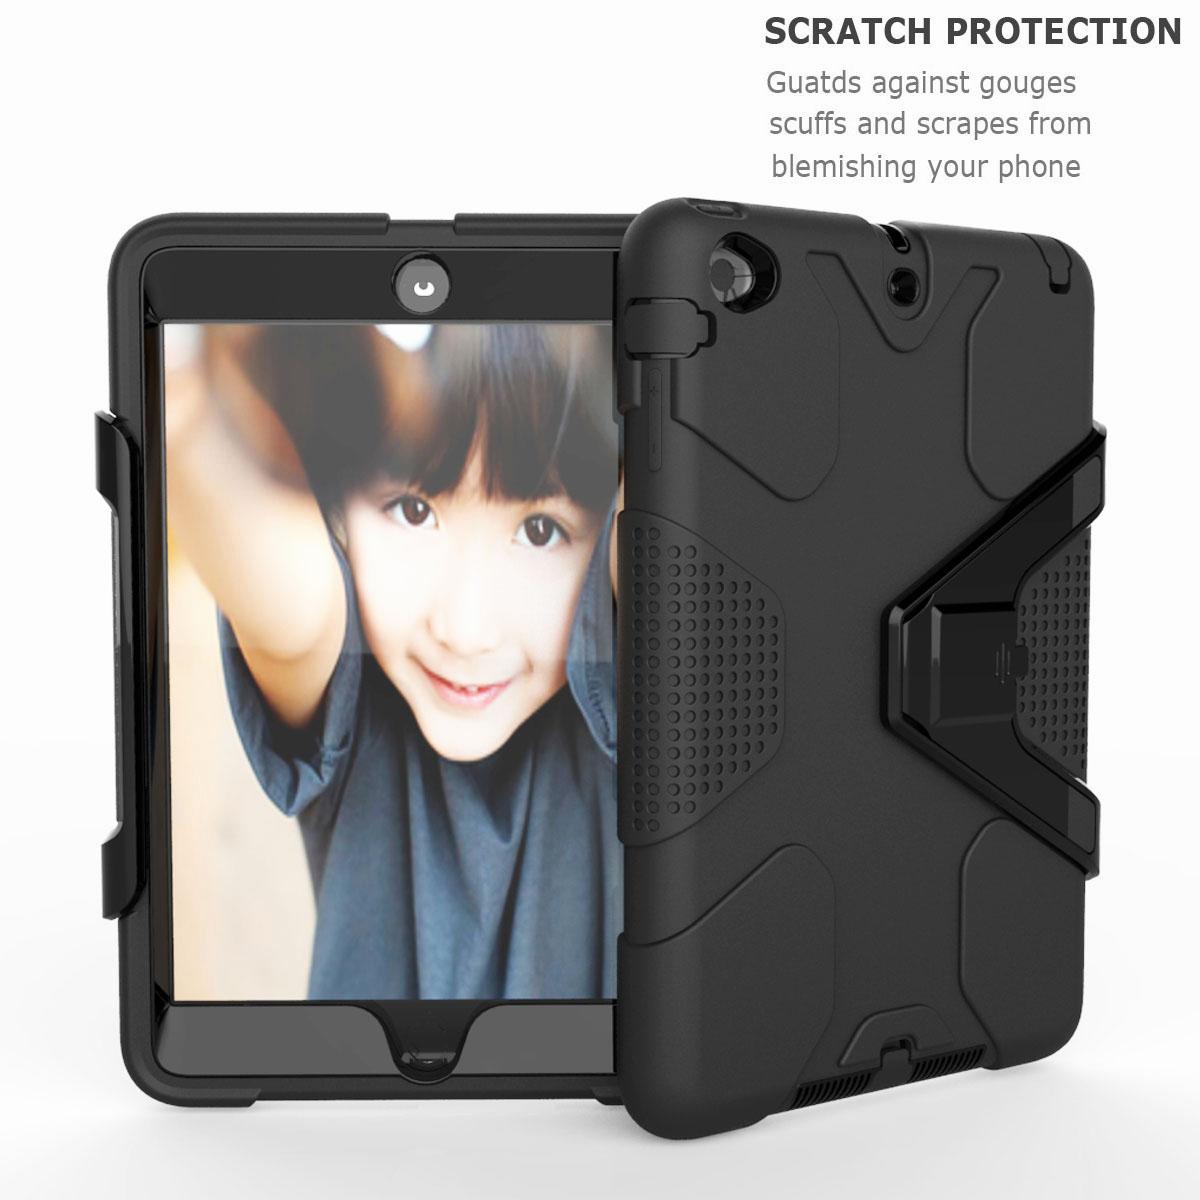 Luxury-Shockproof-Tough-Armor-with-Hard-Kickstand-Case-For-Apple-iPad-Mini-1-2-3 thumbnail 58